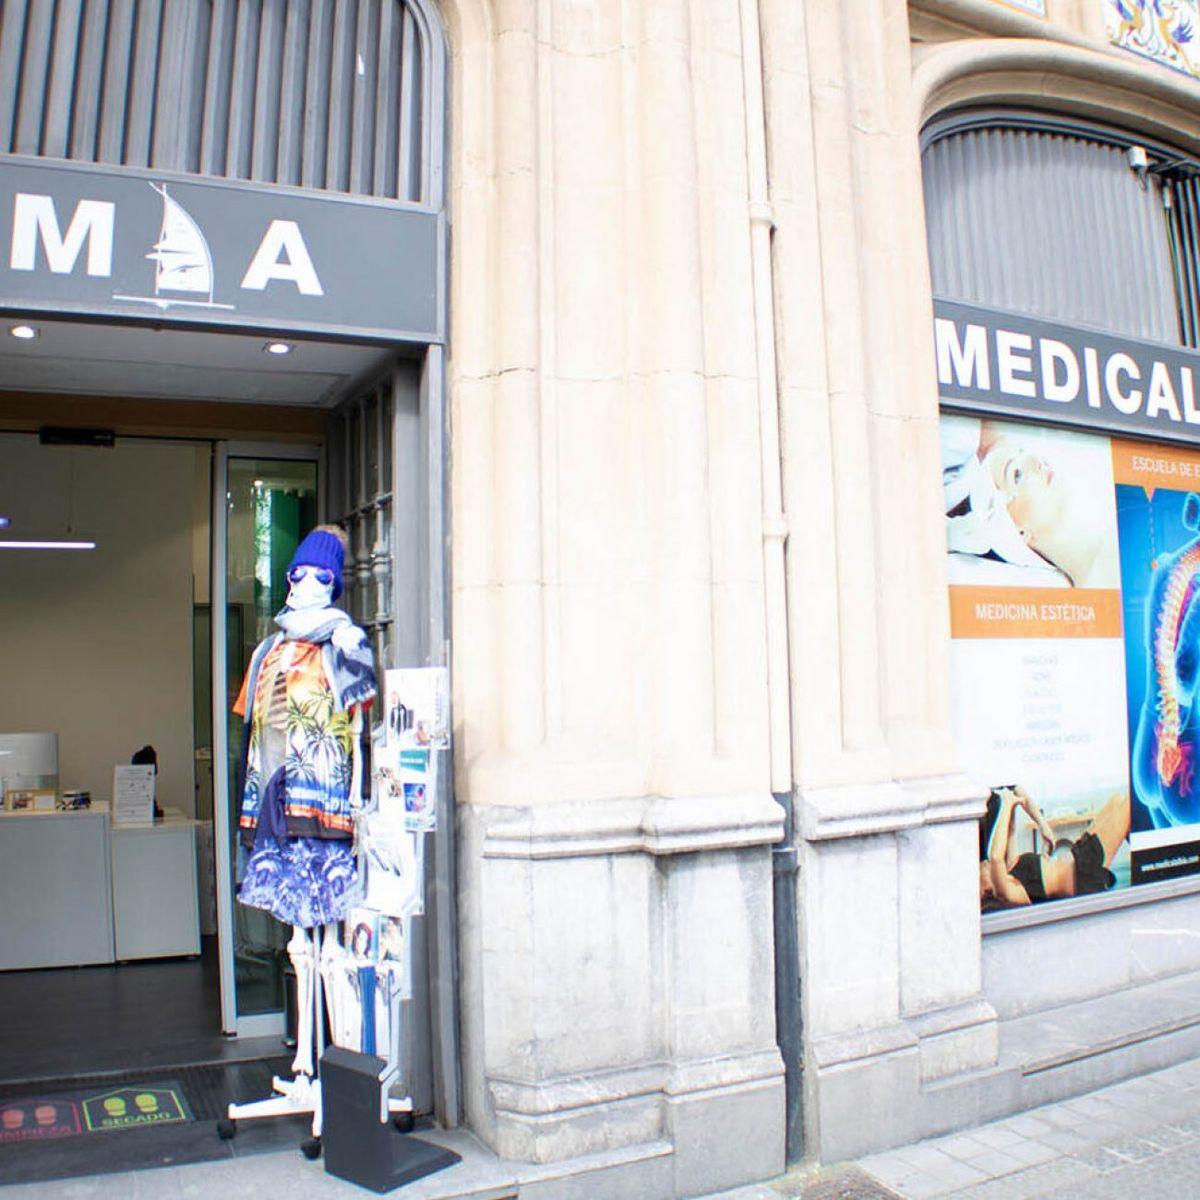 Medical Albia